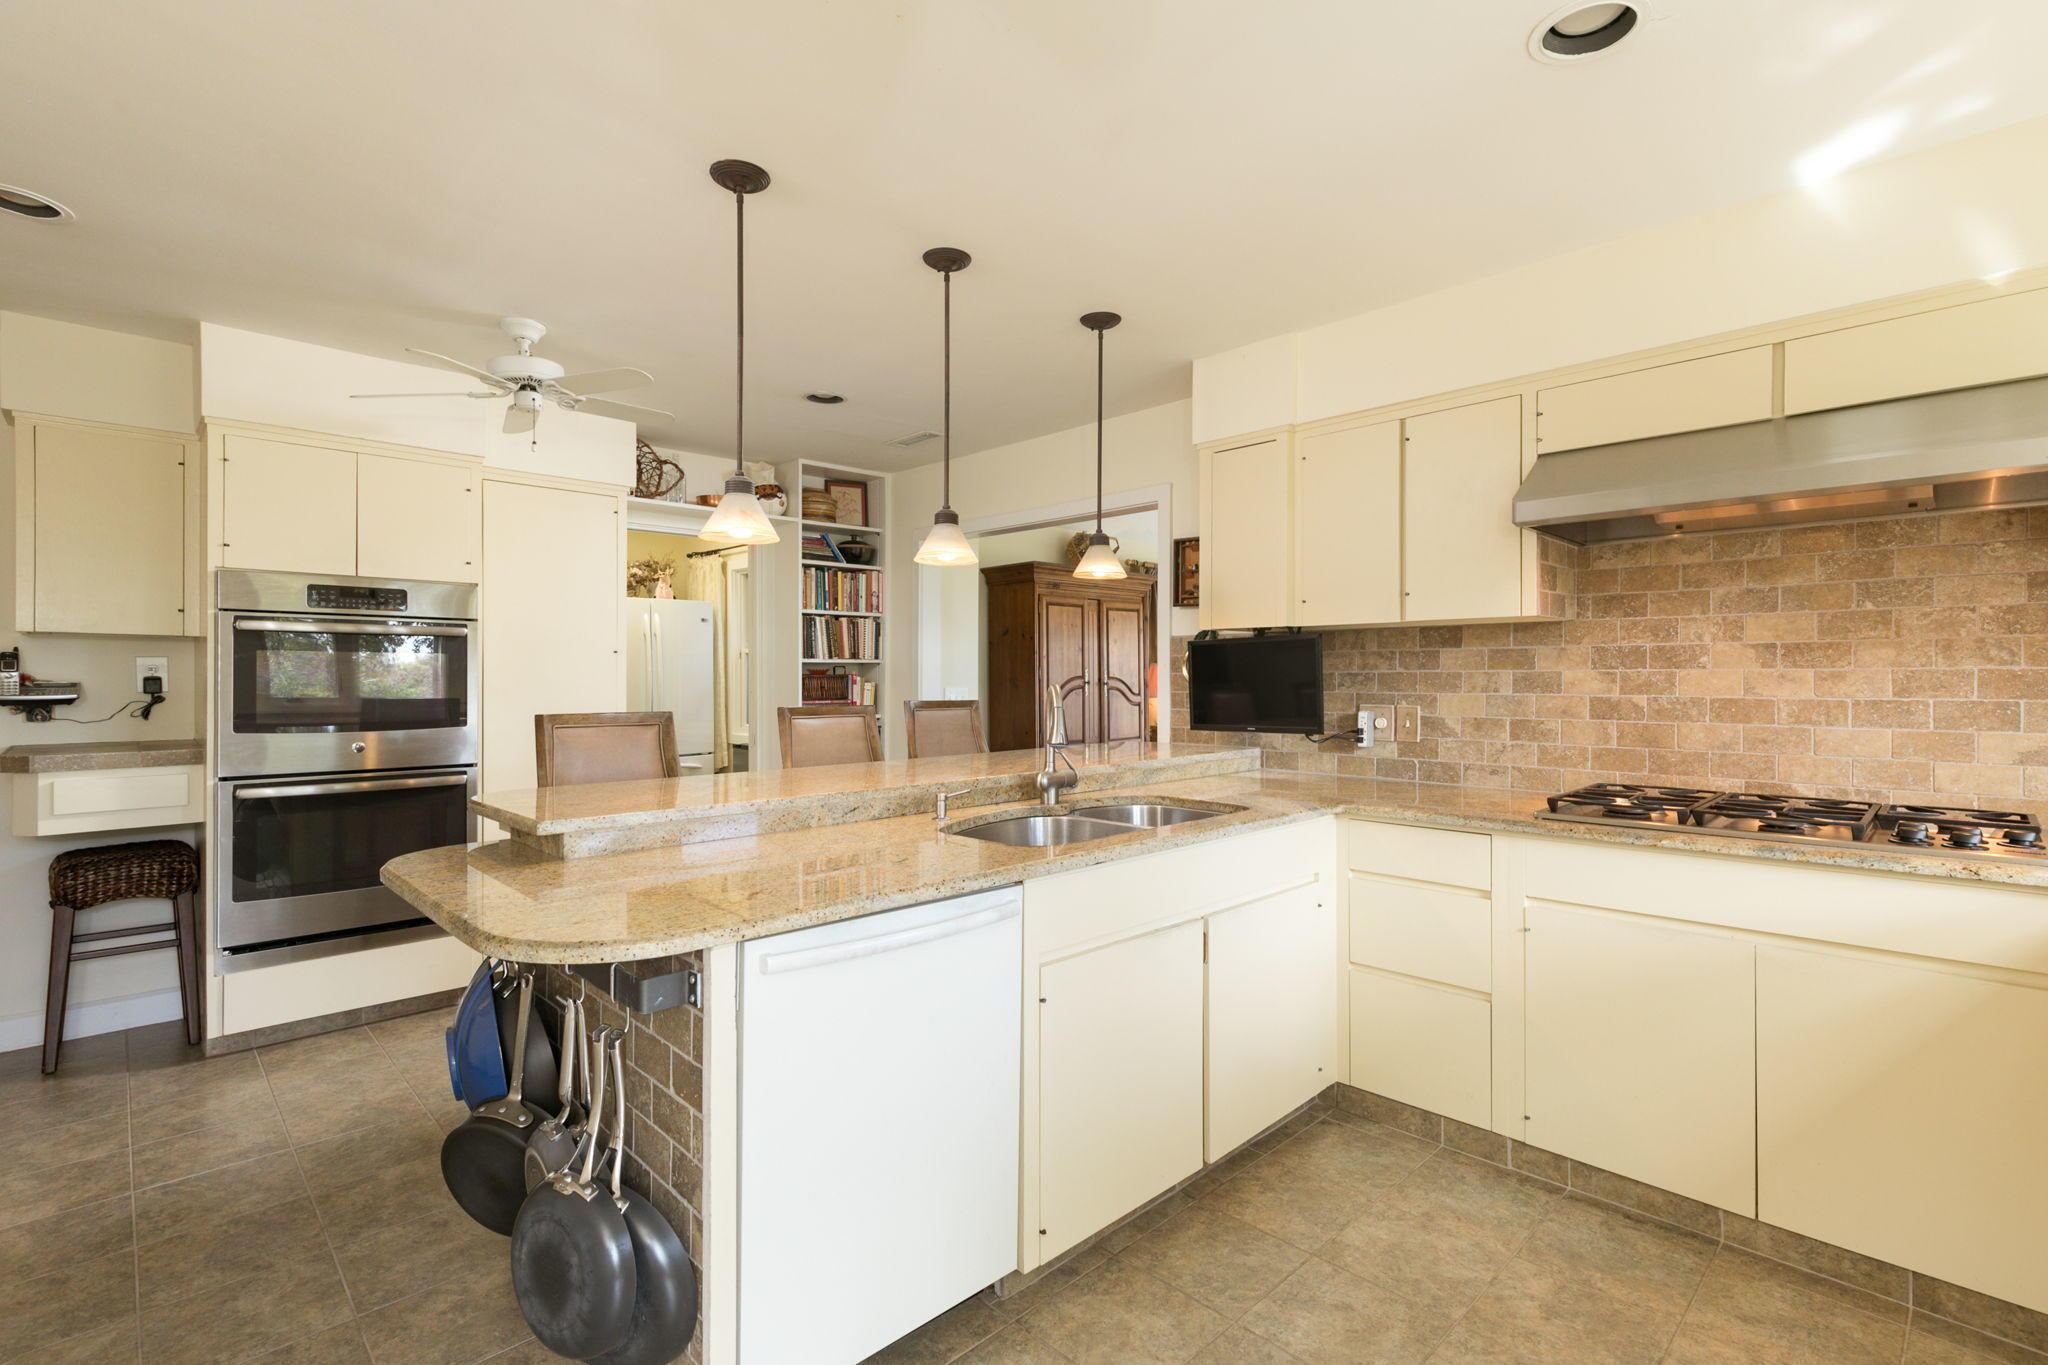 Seabrook Island Homes For Sale - 3360 Seabrook Island, Seabrook Island, SC - 11